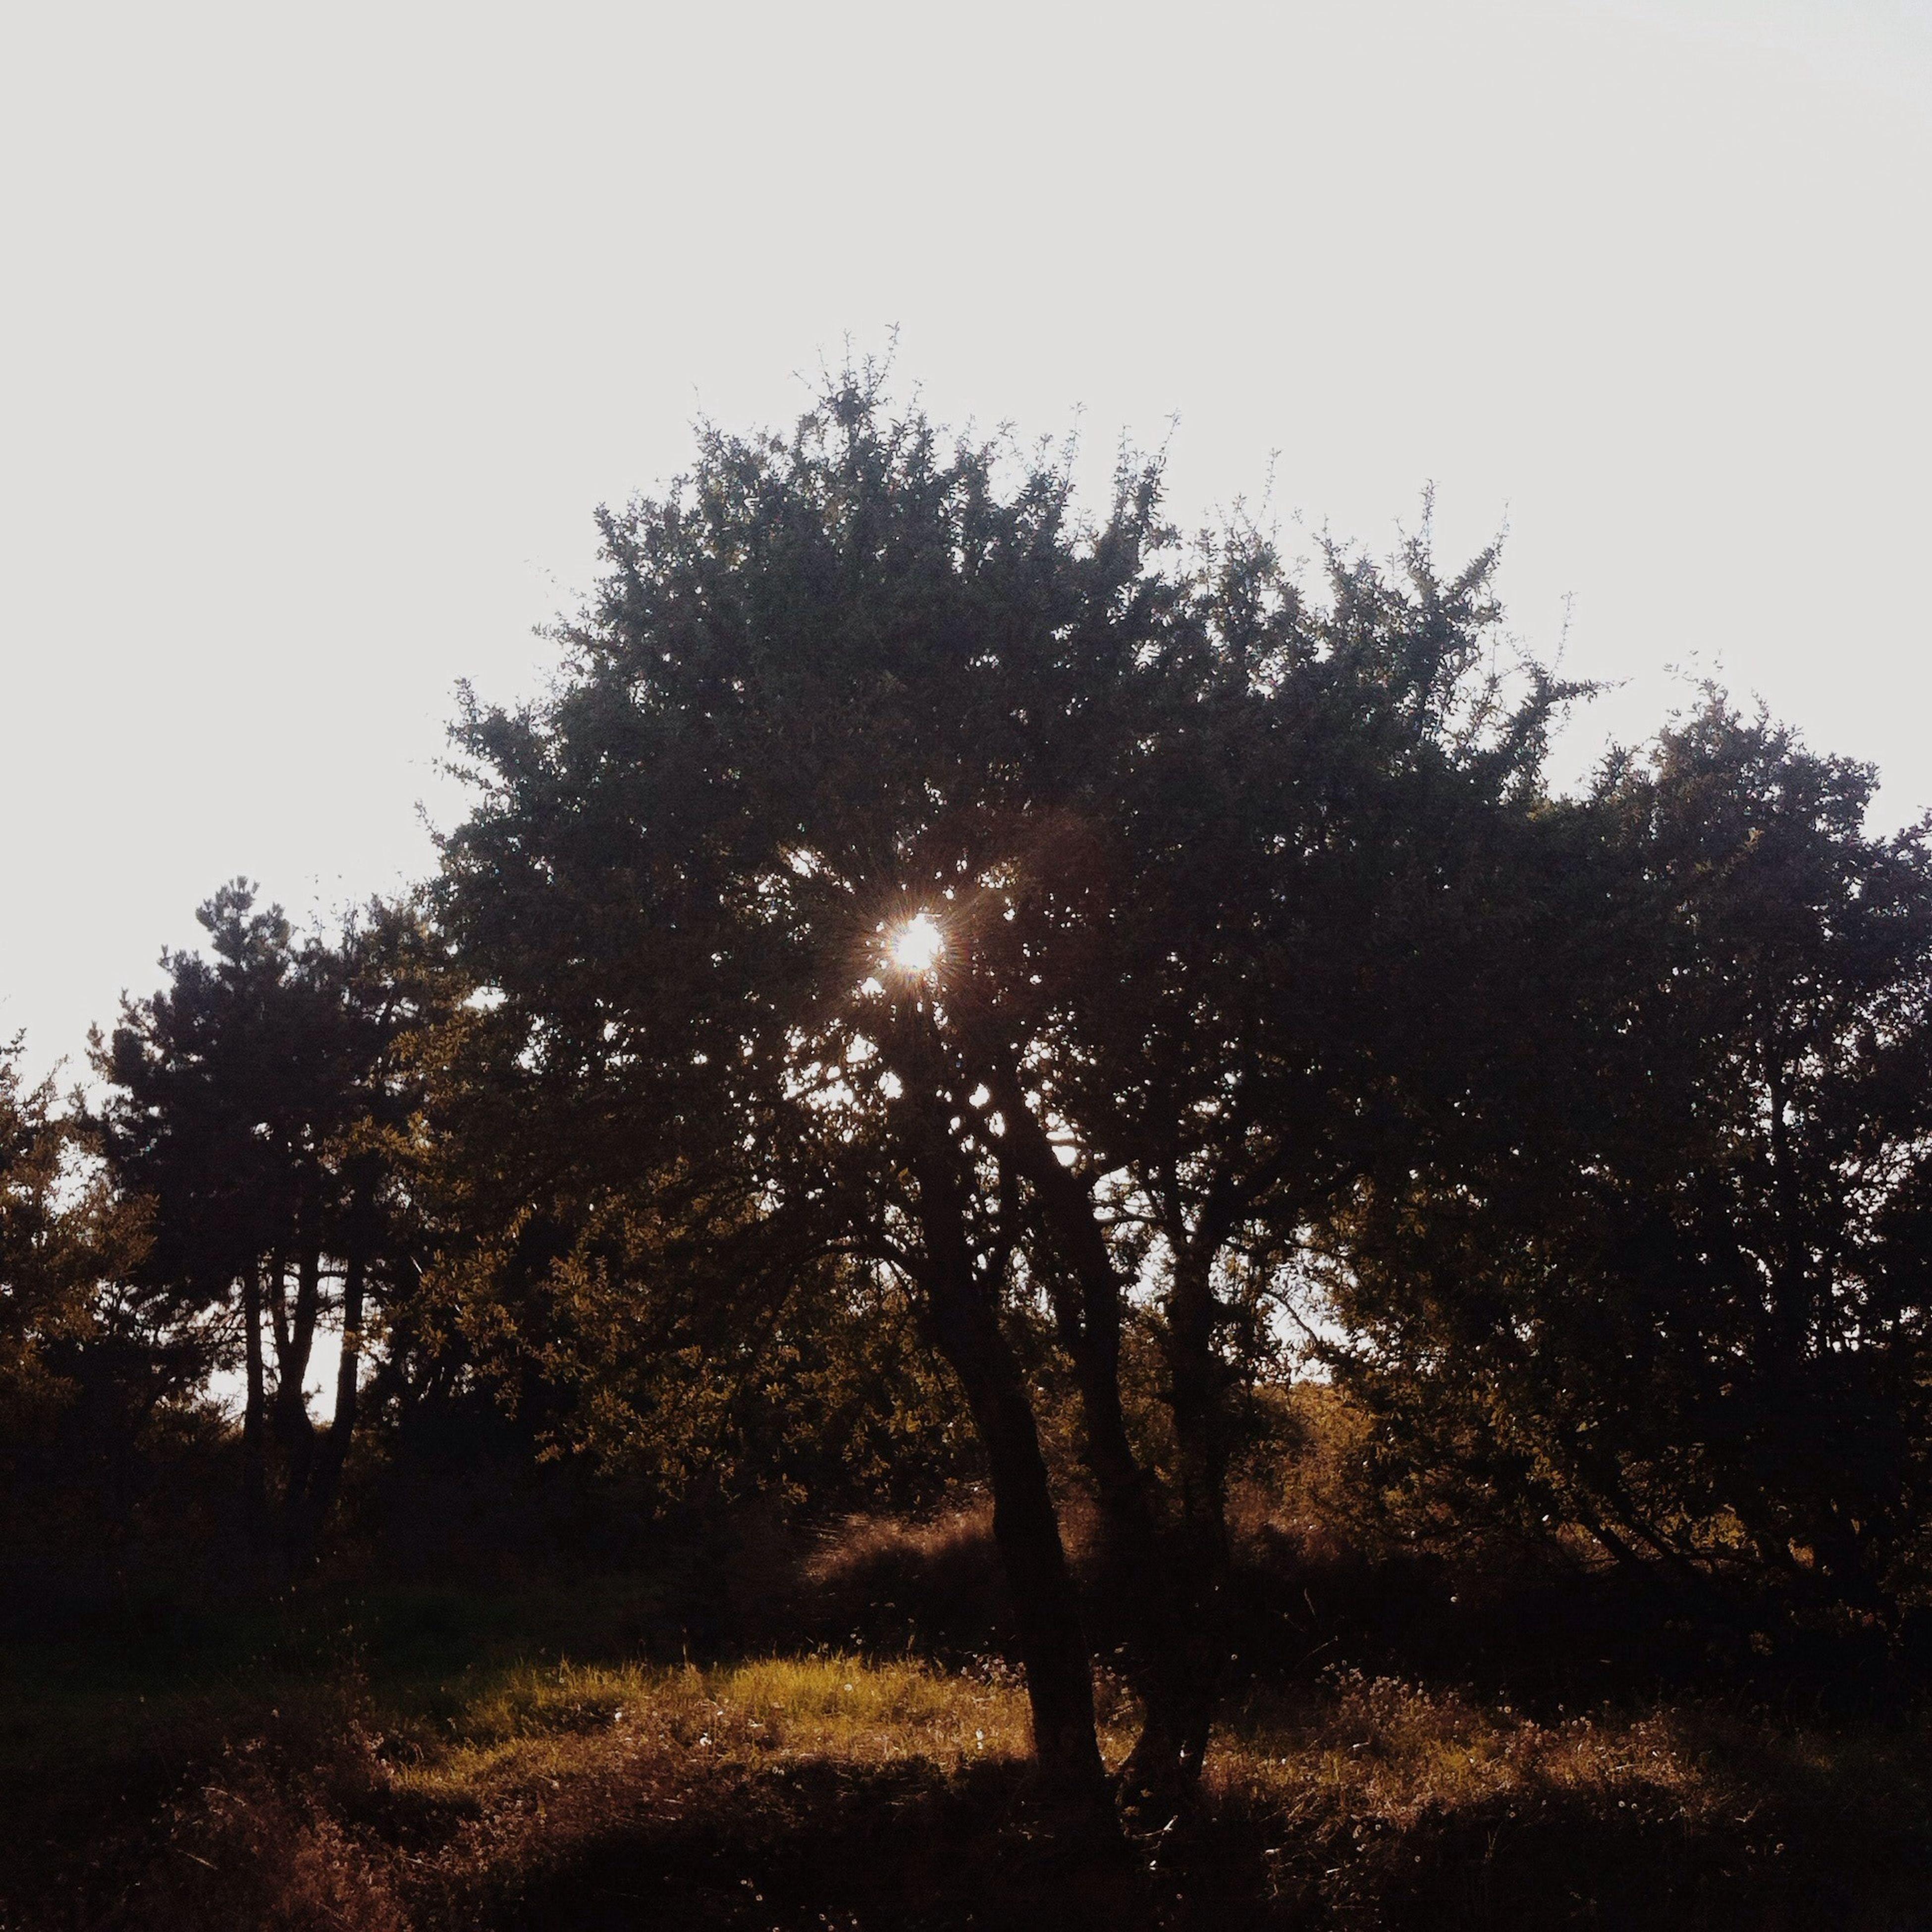 tree, tranquility, silhouette, tranquil scene, sun, clear sky, nature, beauty in nature, scenics, growth, sunlight, field, landscape, sky, branch, non-urban scene, sunbeam, sunset, tree trunk, idyllic